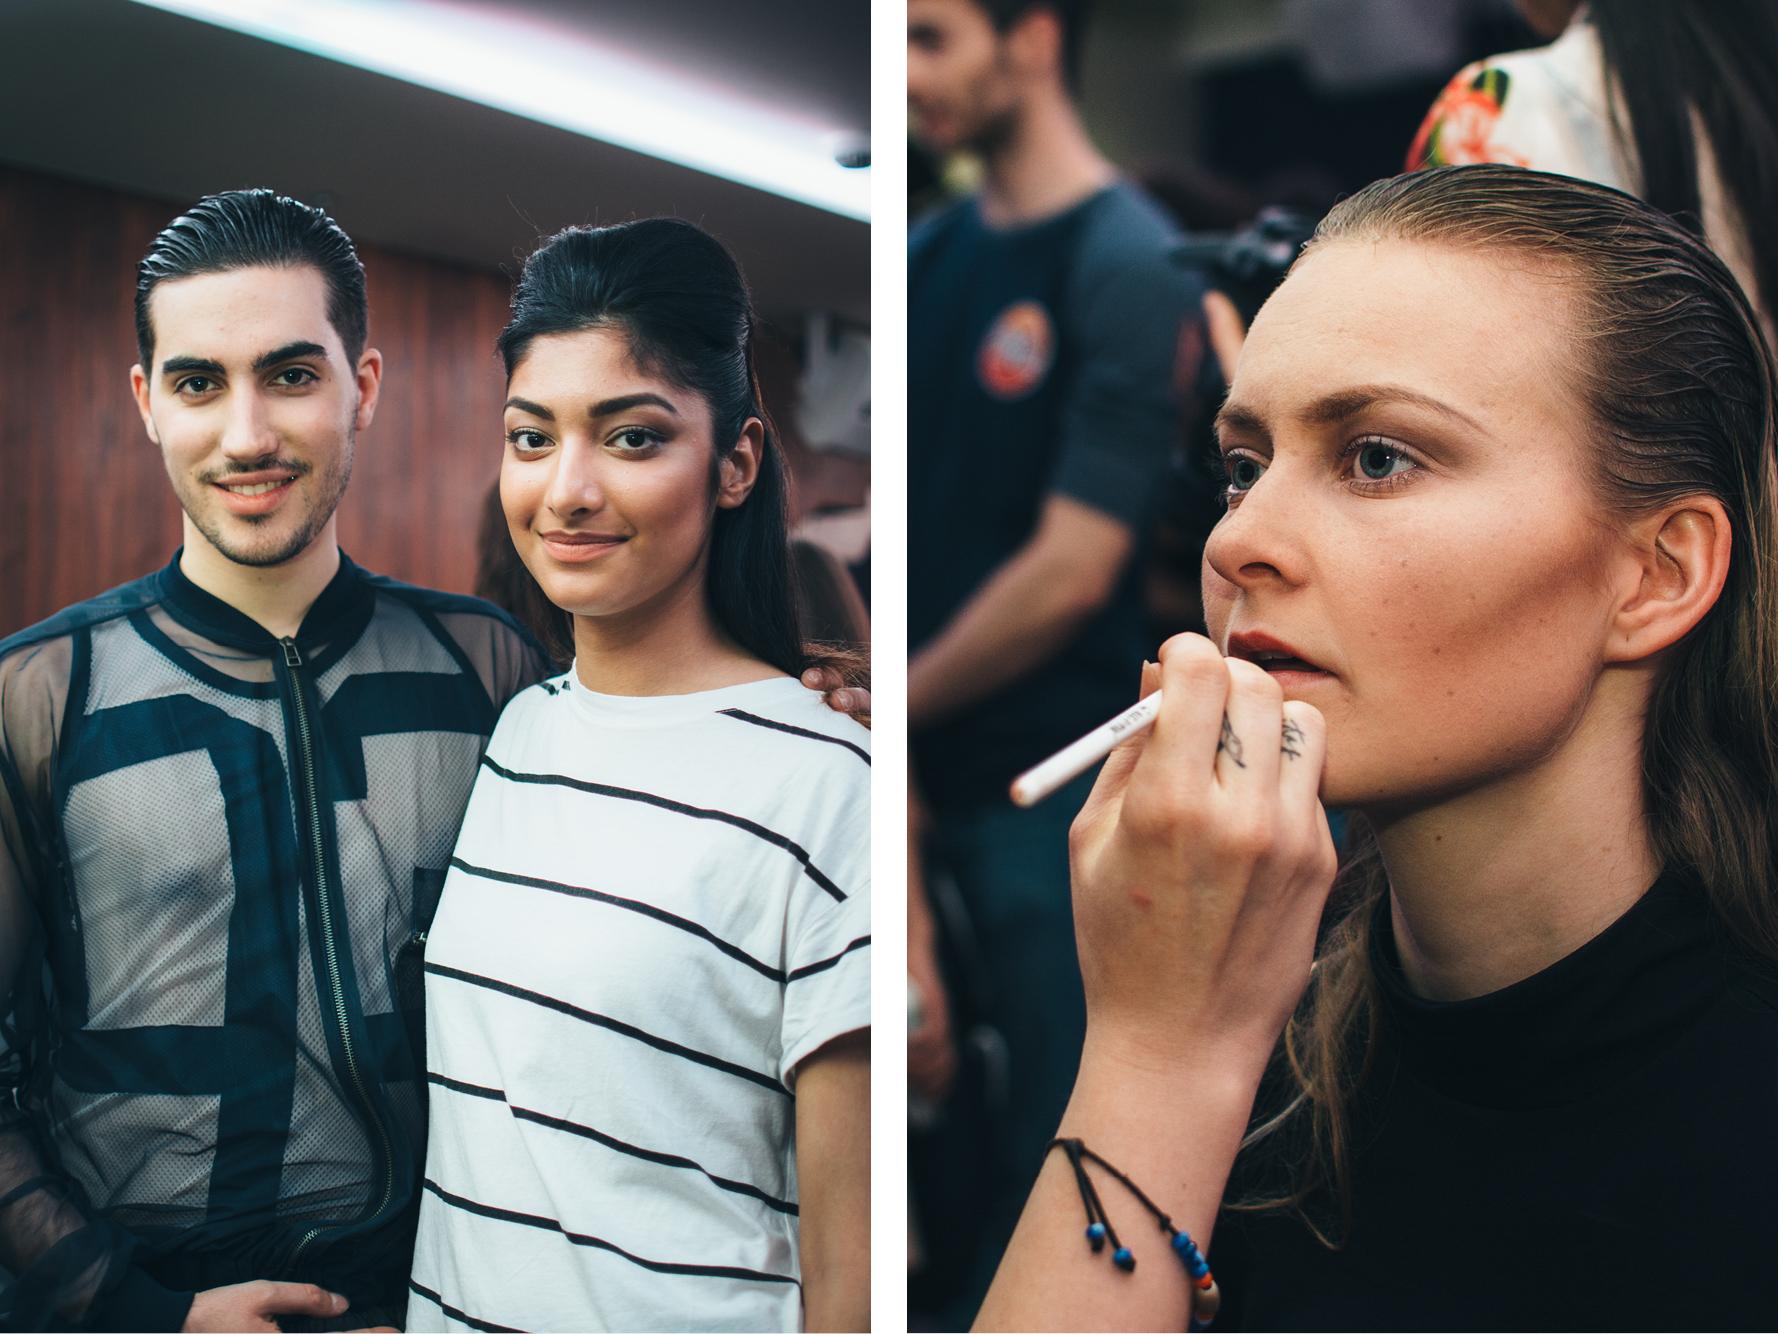 Backstage, New Fashion Society Fashion Show, photo by José Chan